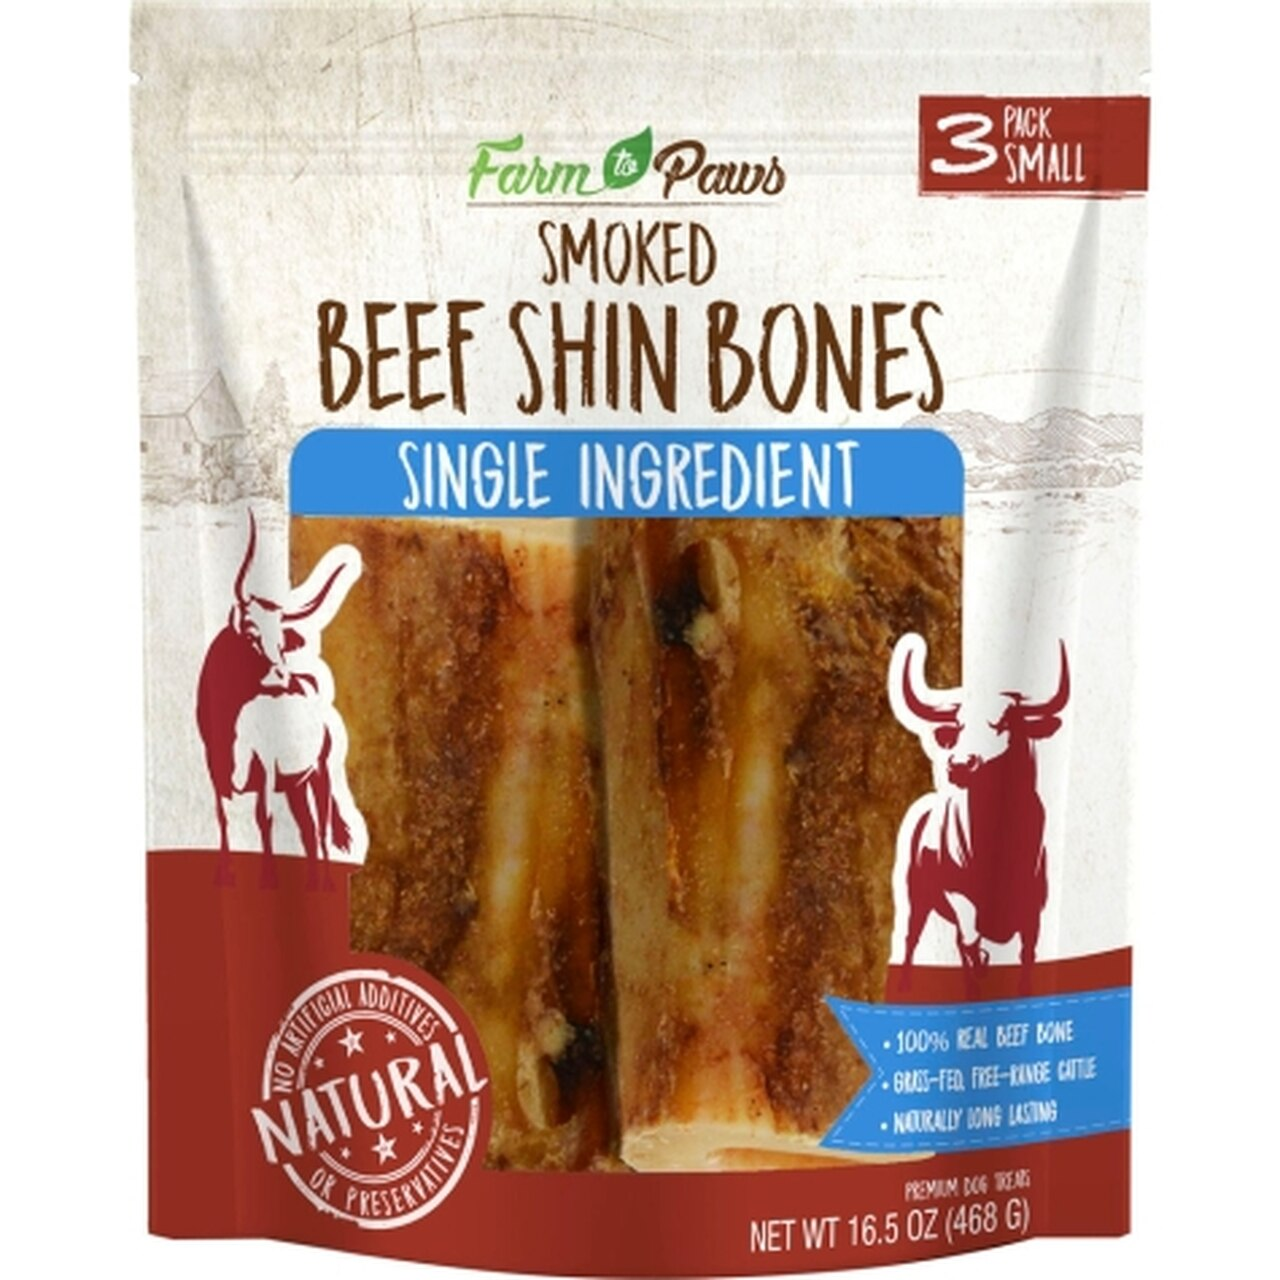 Farm to Paws Smoked Shin Bones Dog Treats, Medium, 3-pk